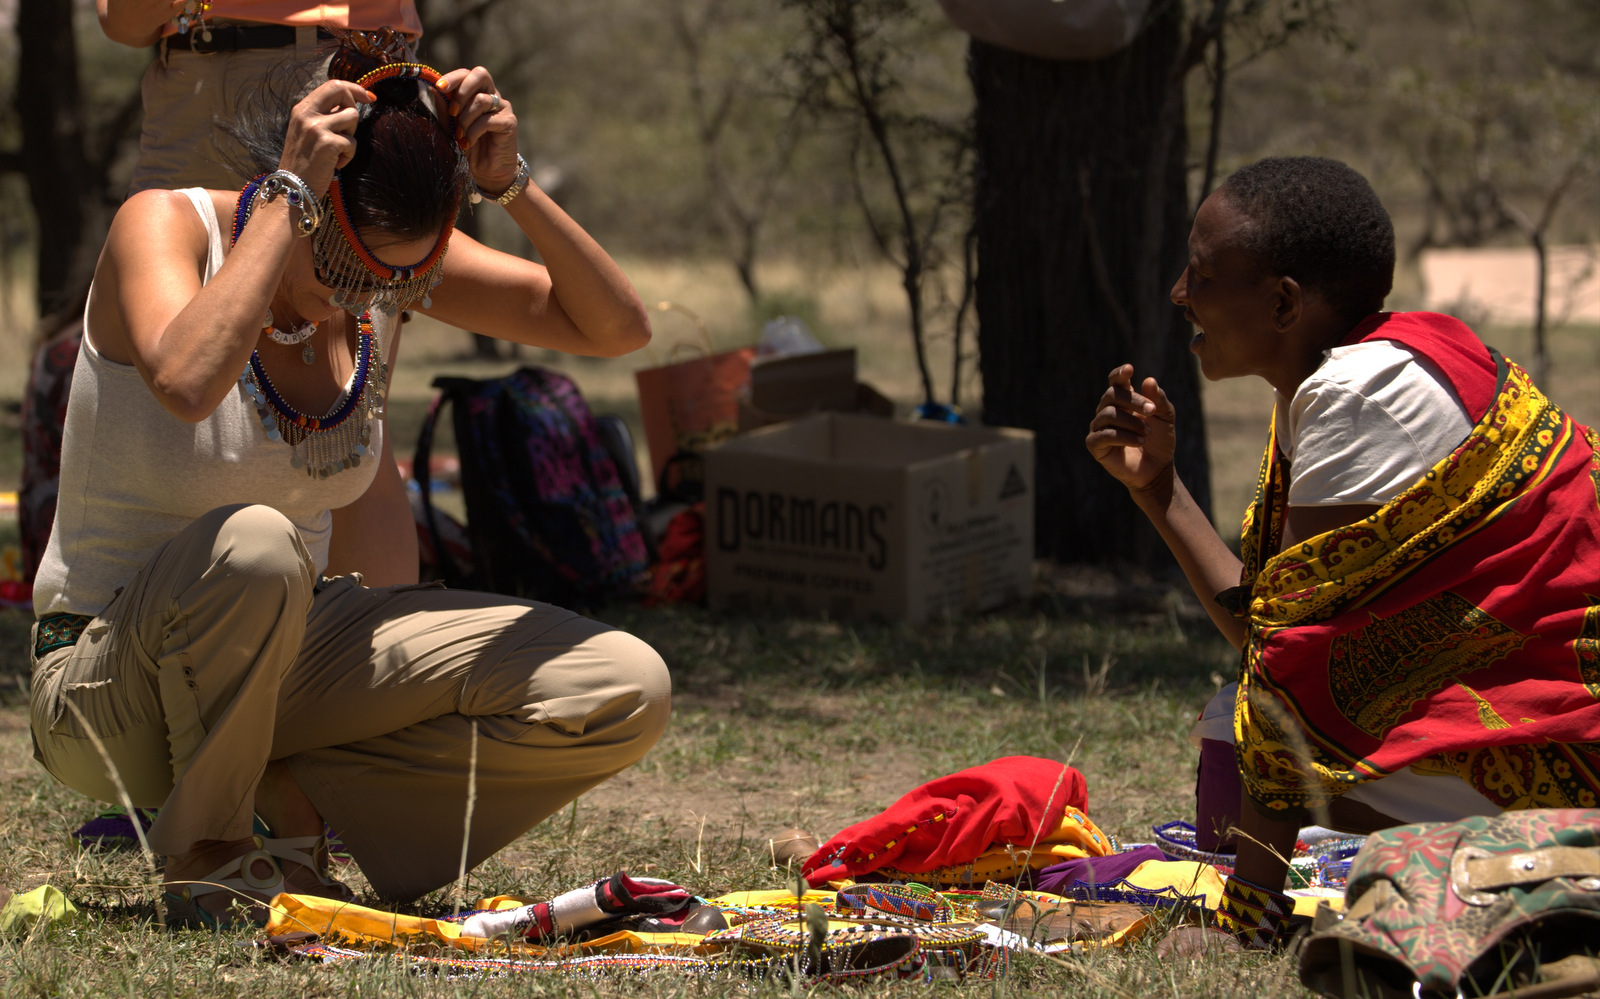 Tourism soko (market) Naboisho communities - beadwork